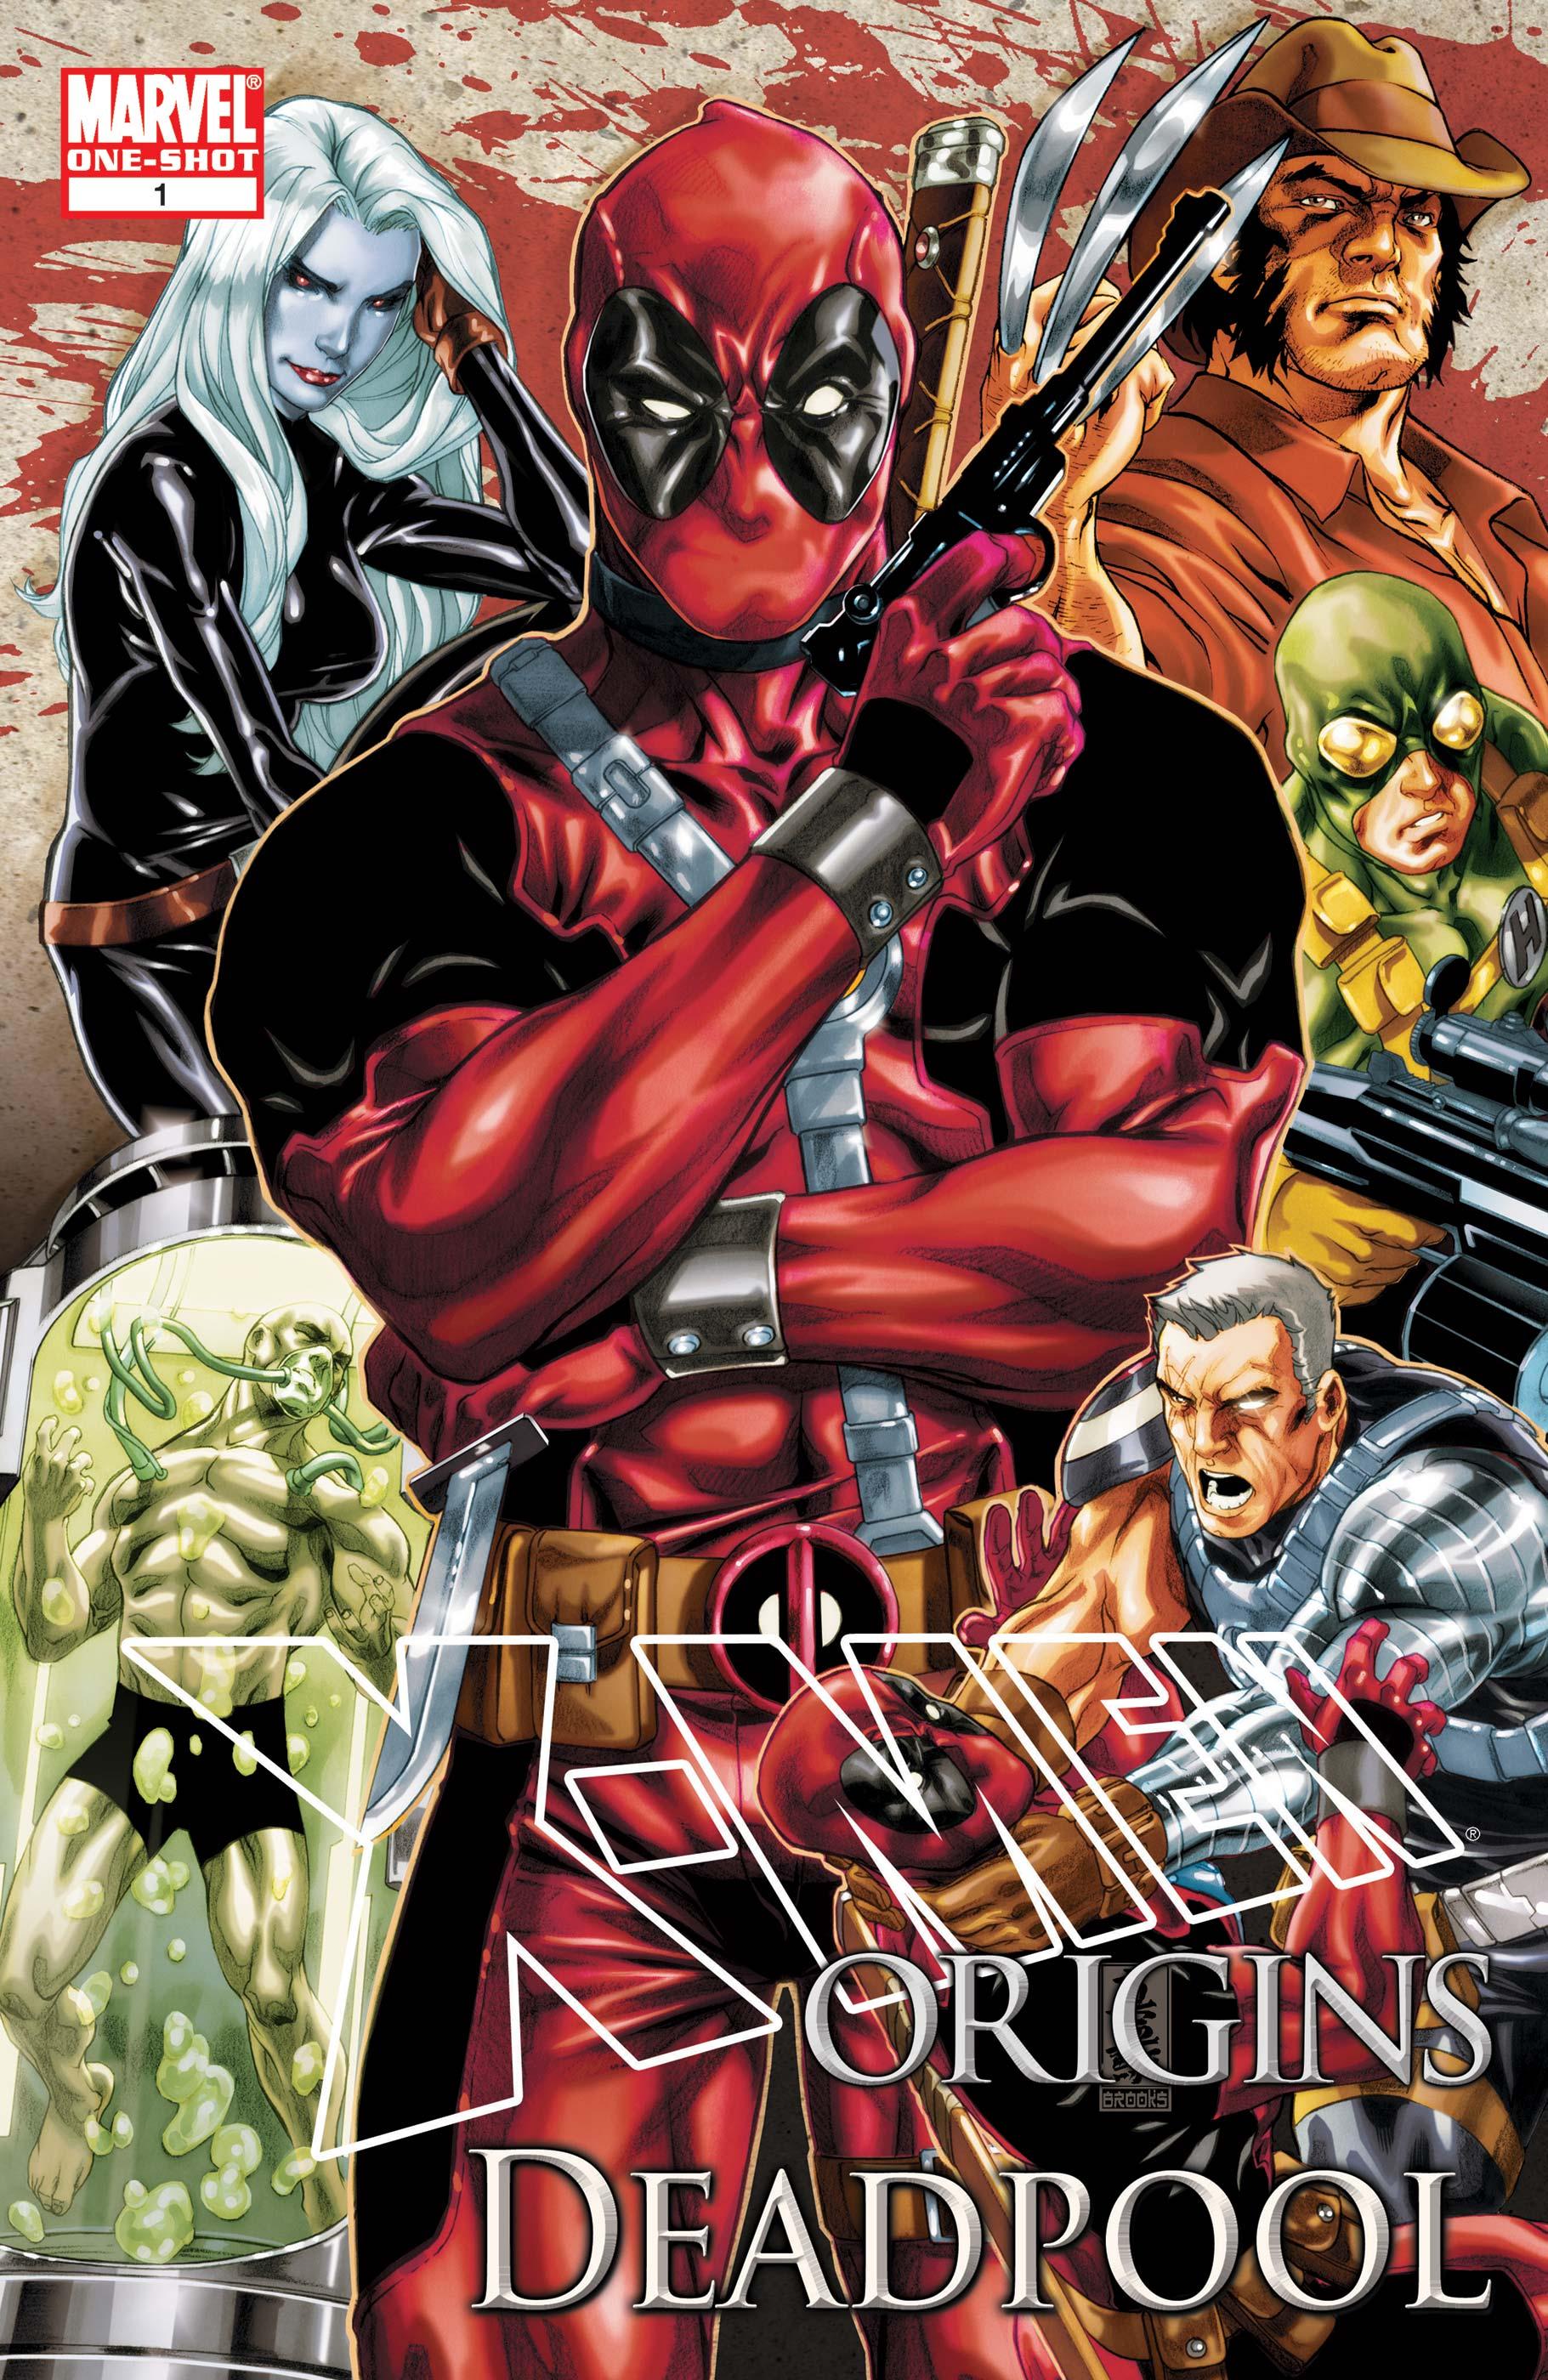 X-Men Origins: Deadpool (2010) #1